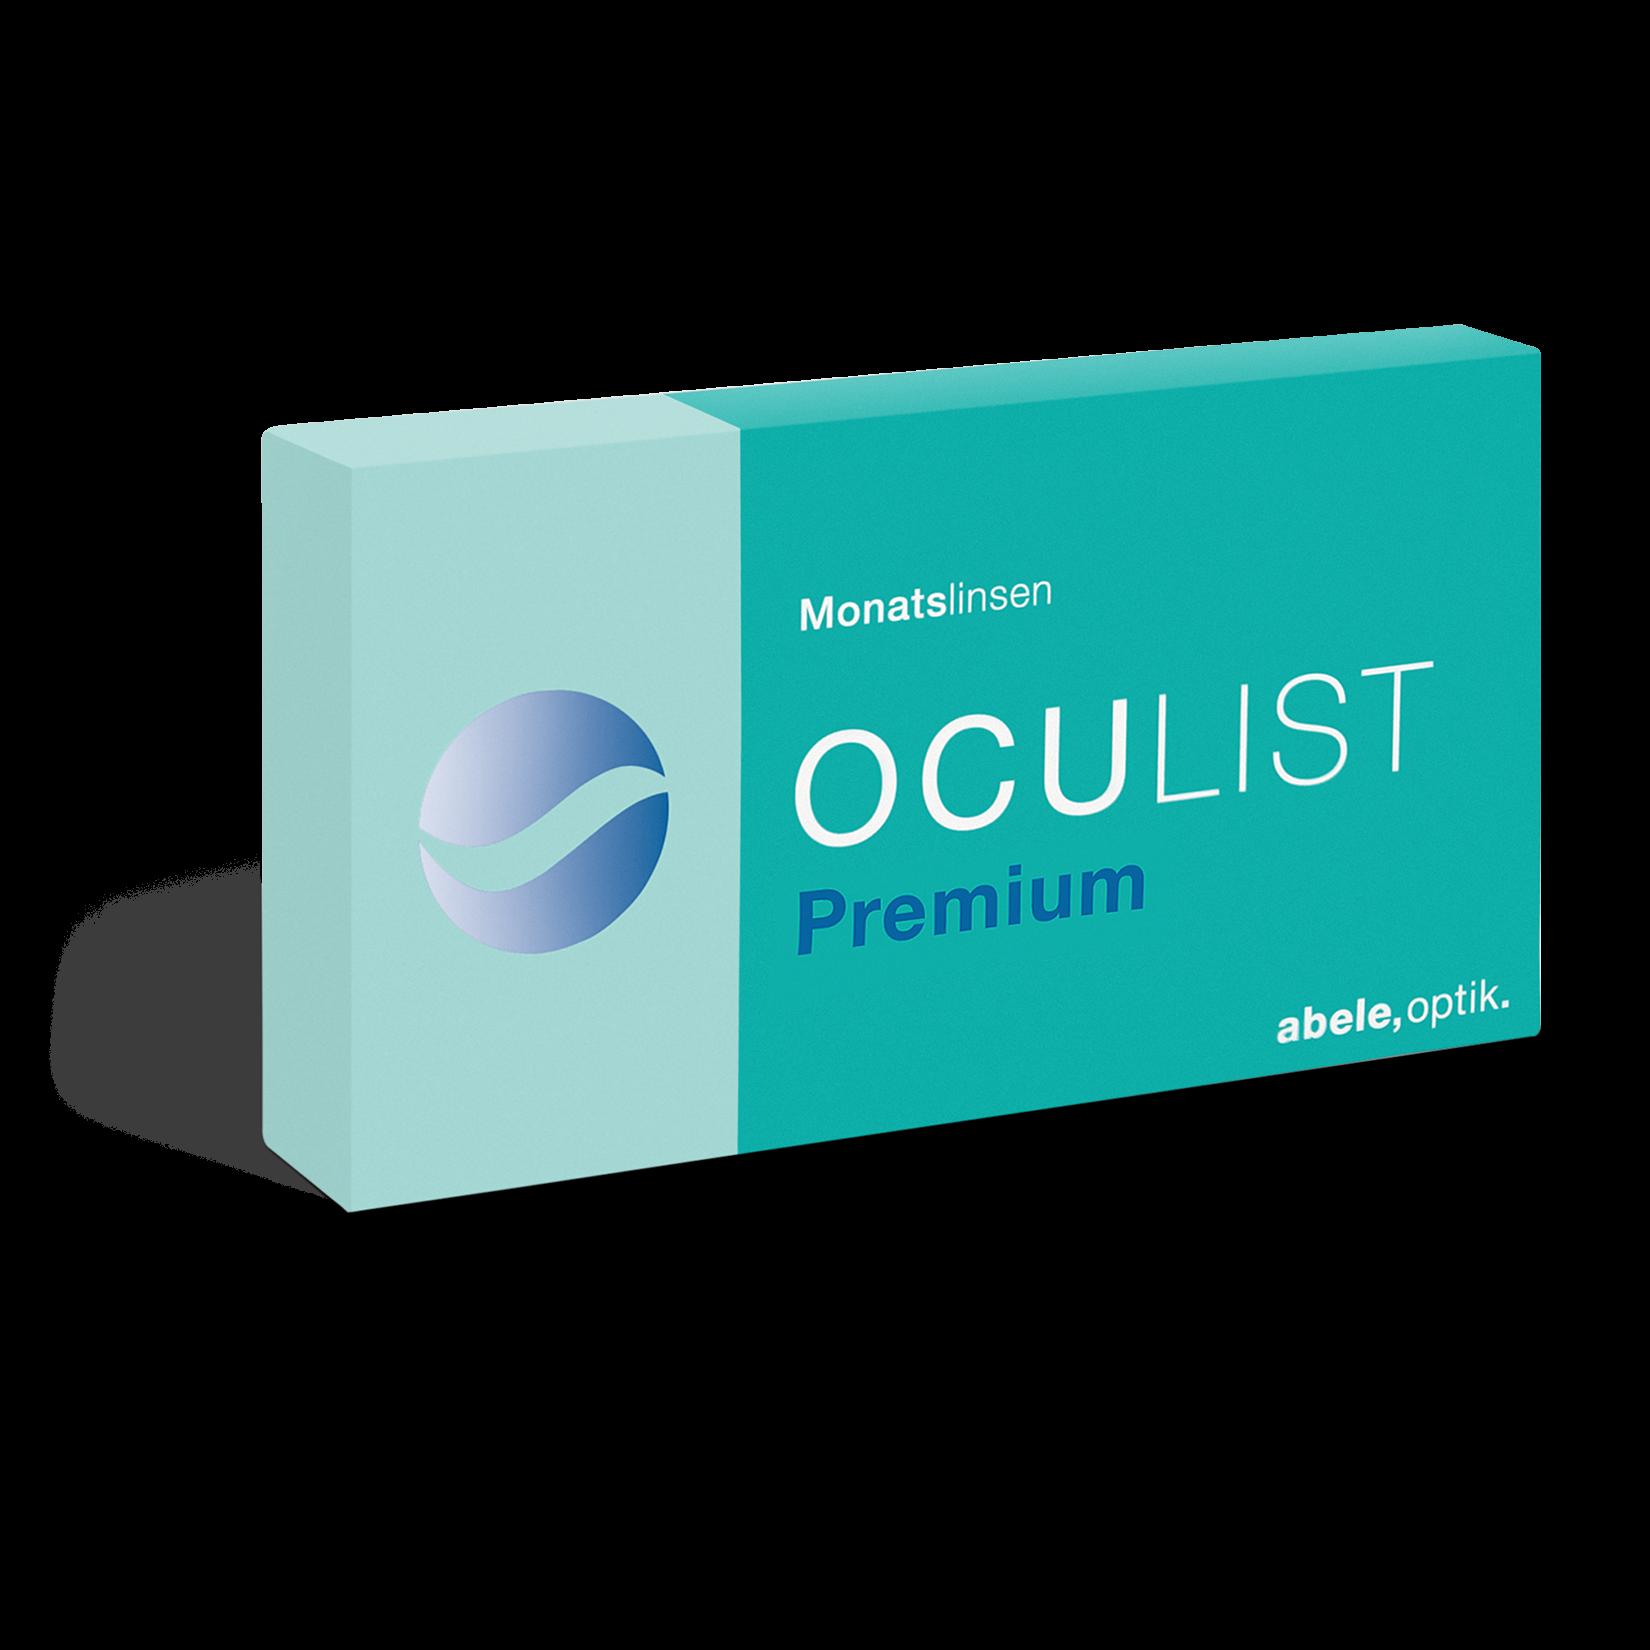 Oculist Premium, Abele Optik (6 Stk.)